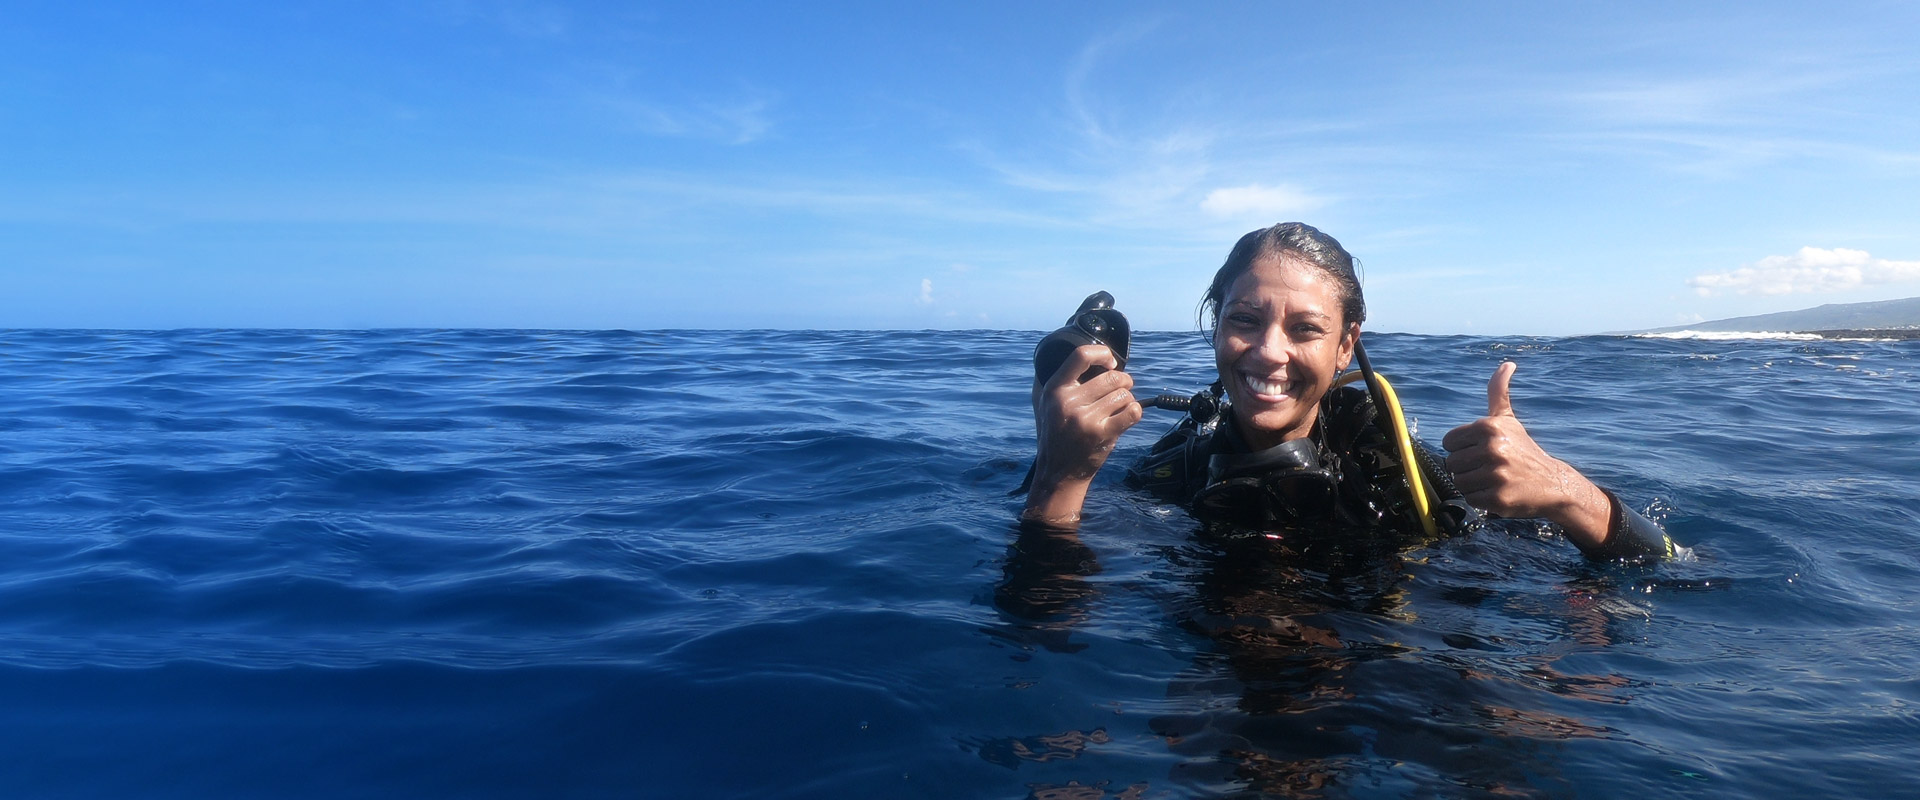 Photo Baptême de plongée